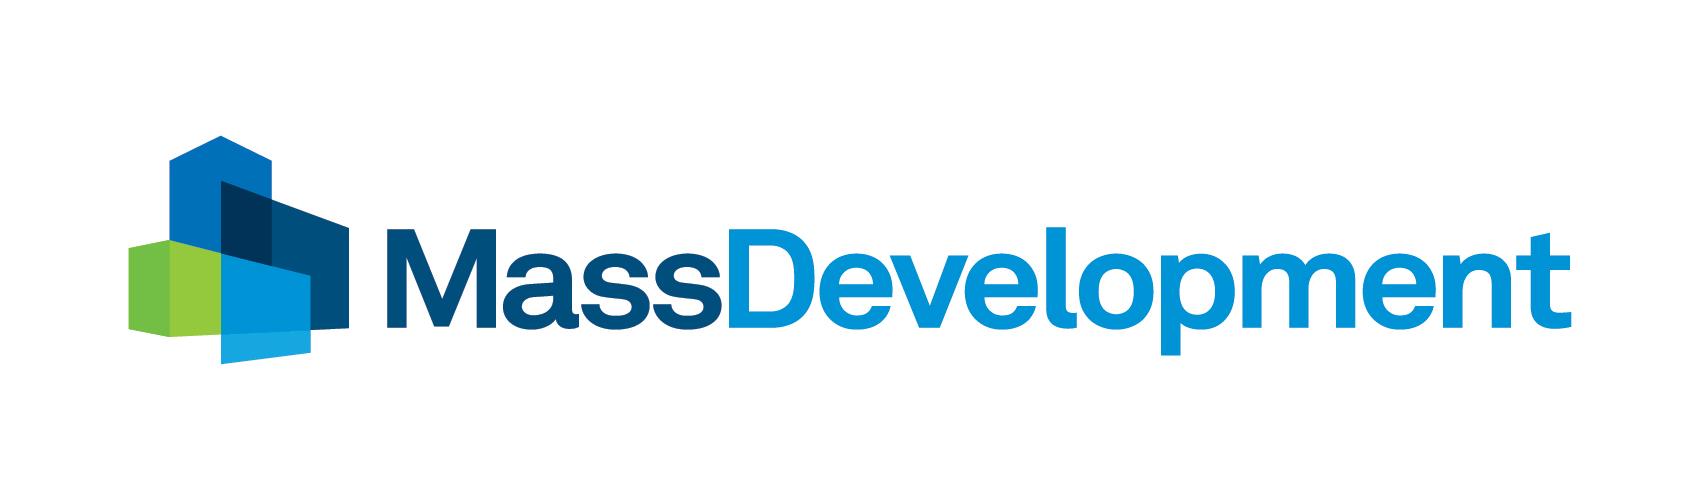 massdev_logo_notag_4c-copy